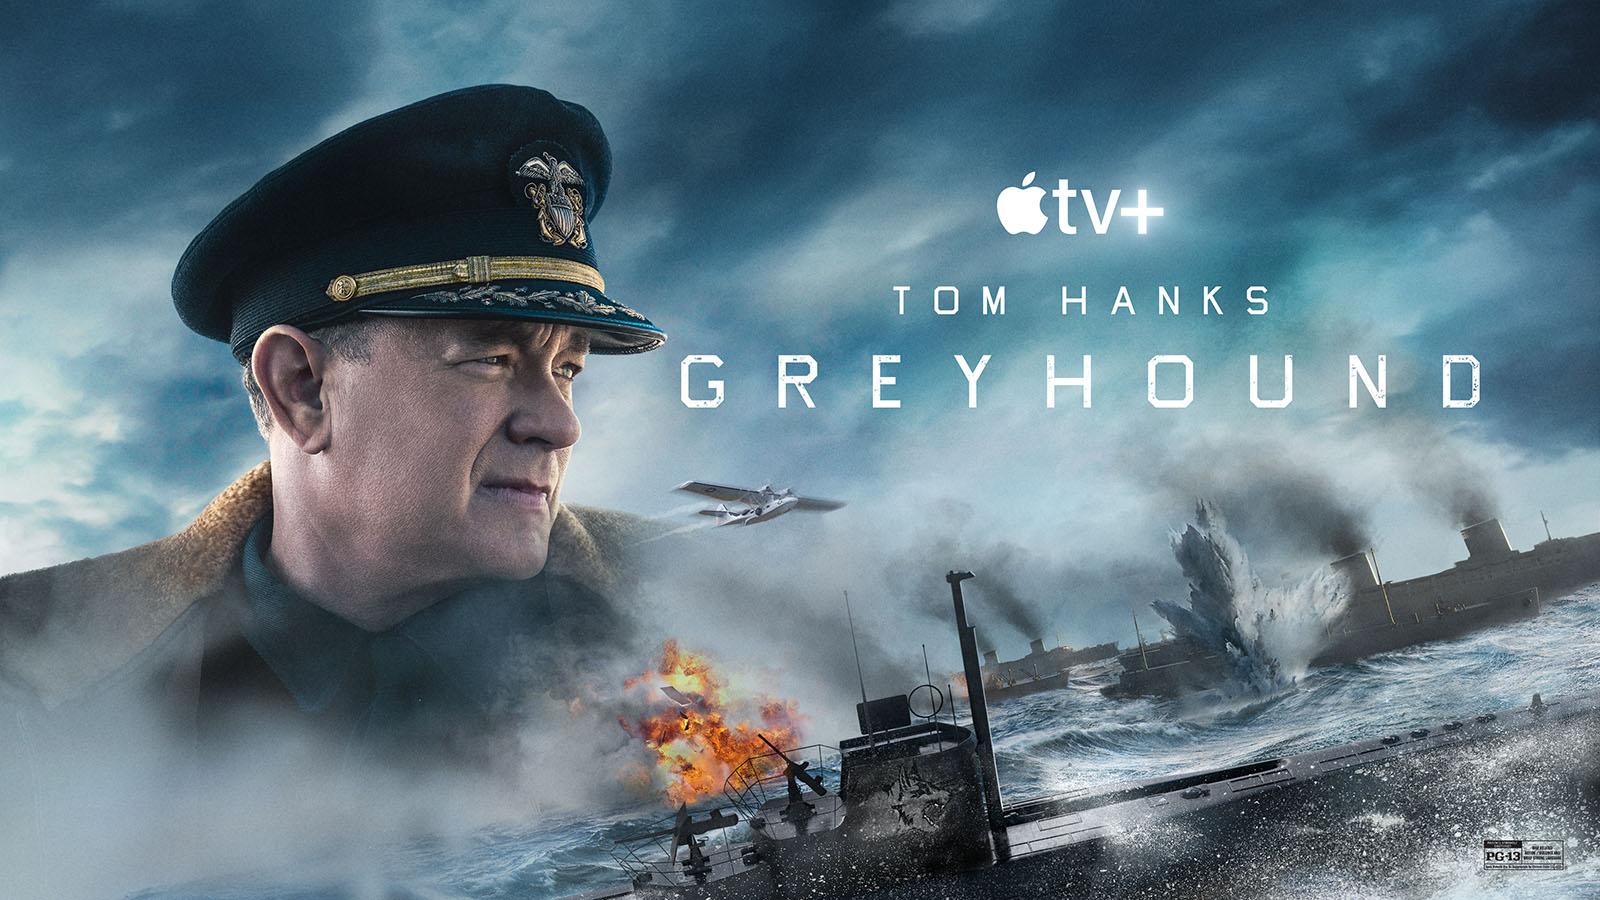 Greyhound (2020) Film Online Subtitrat in Romana cu Tom Hanks